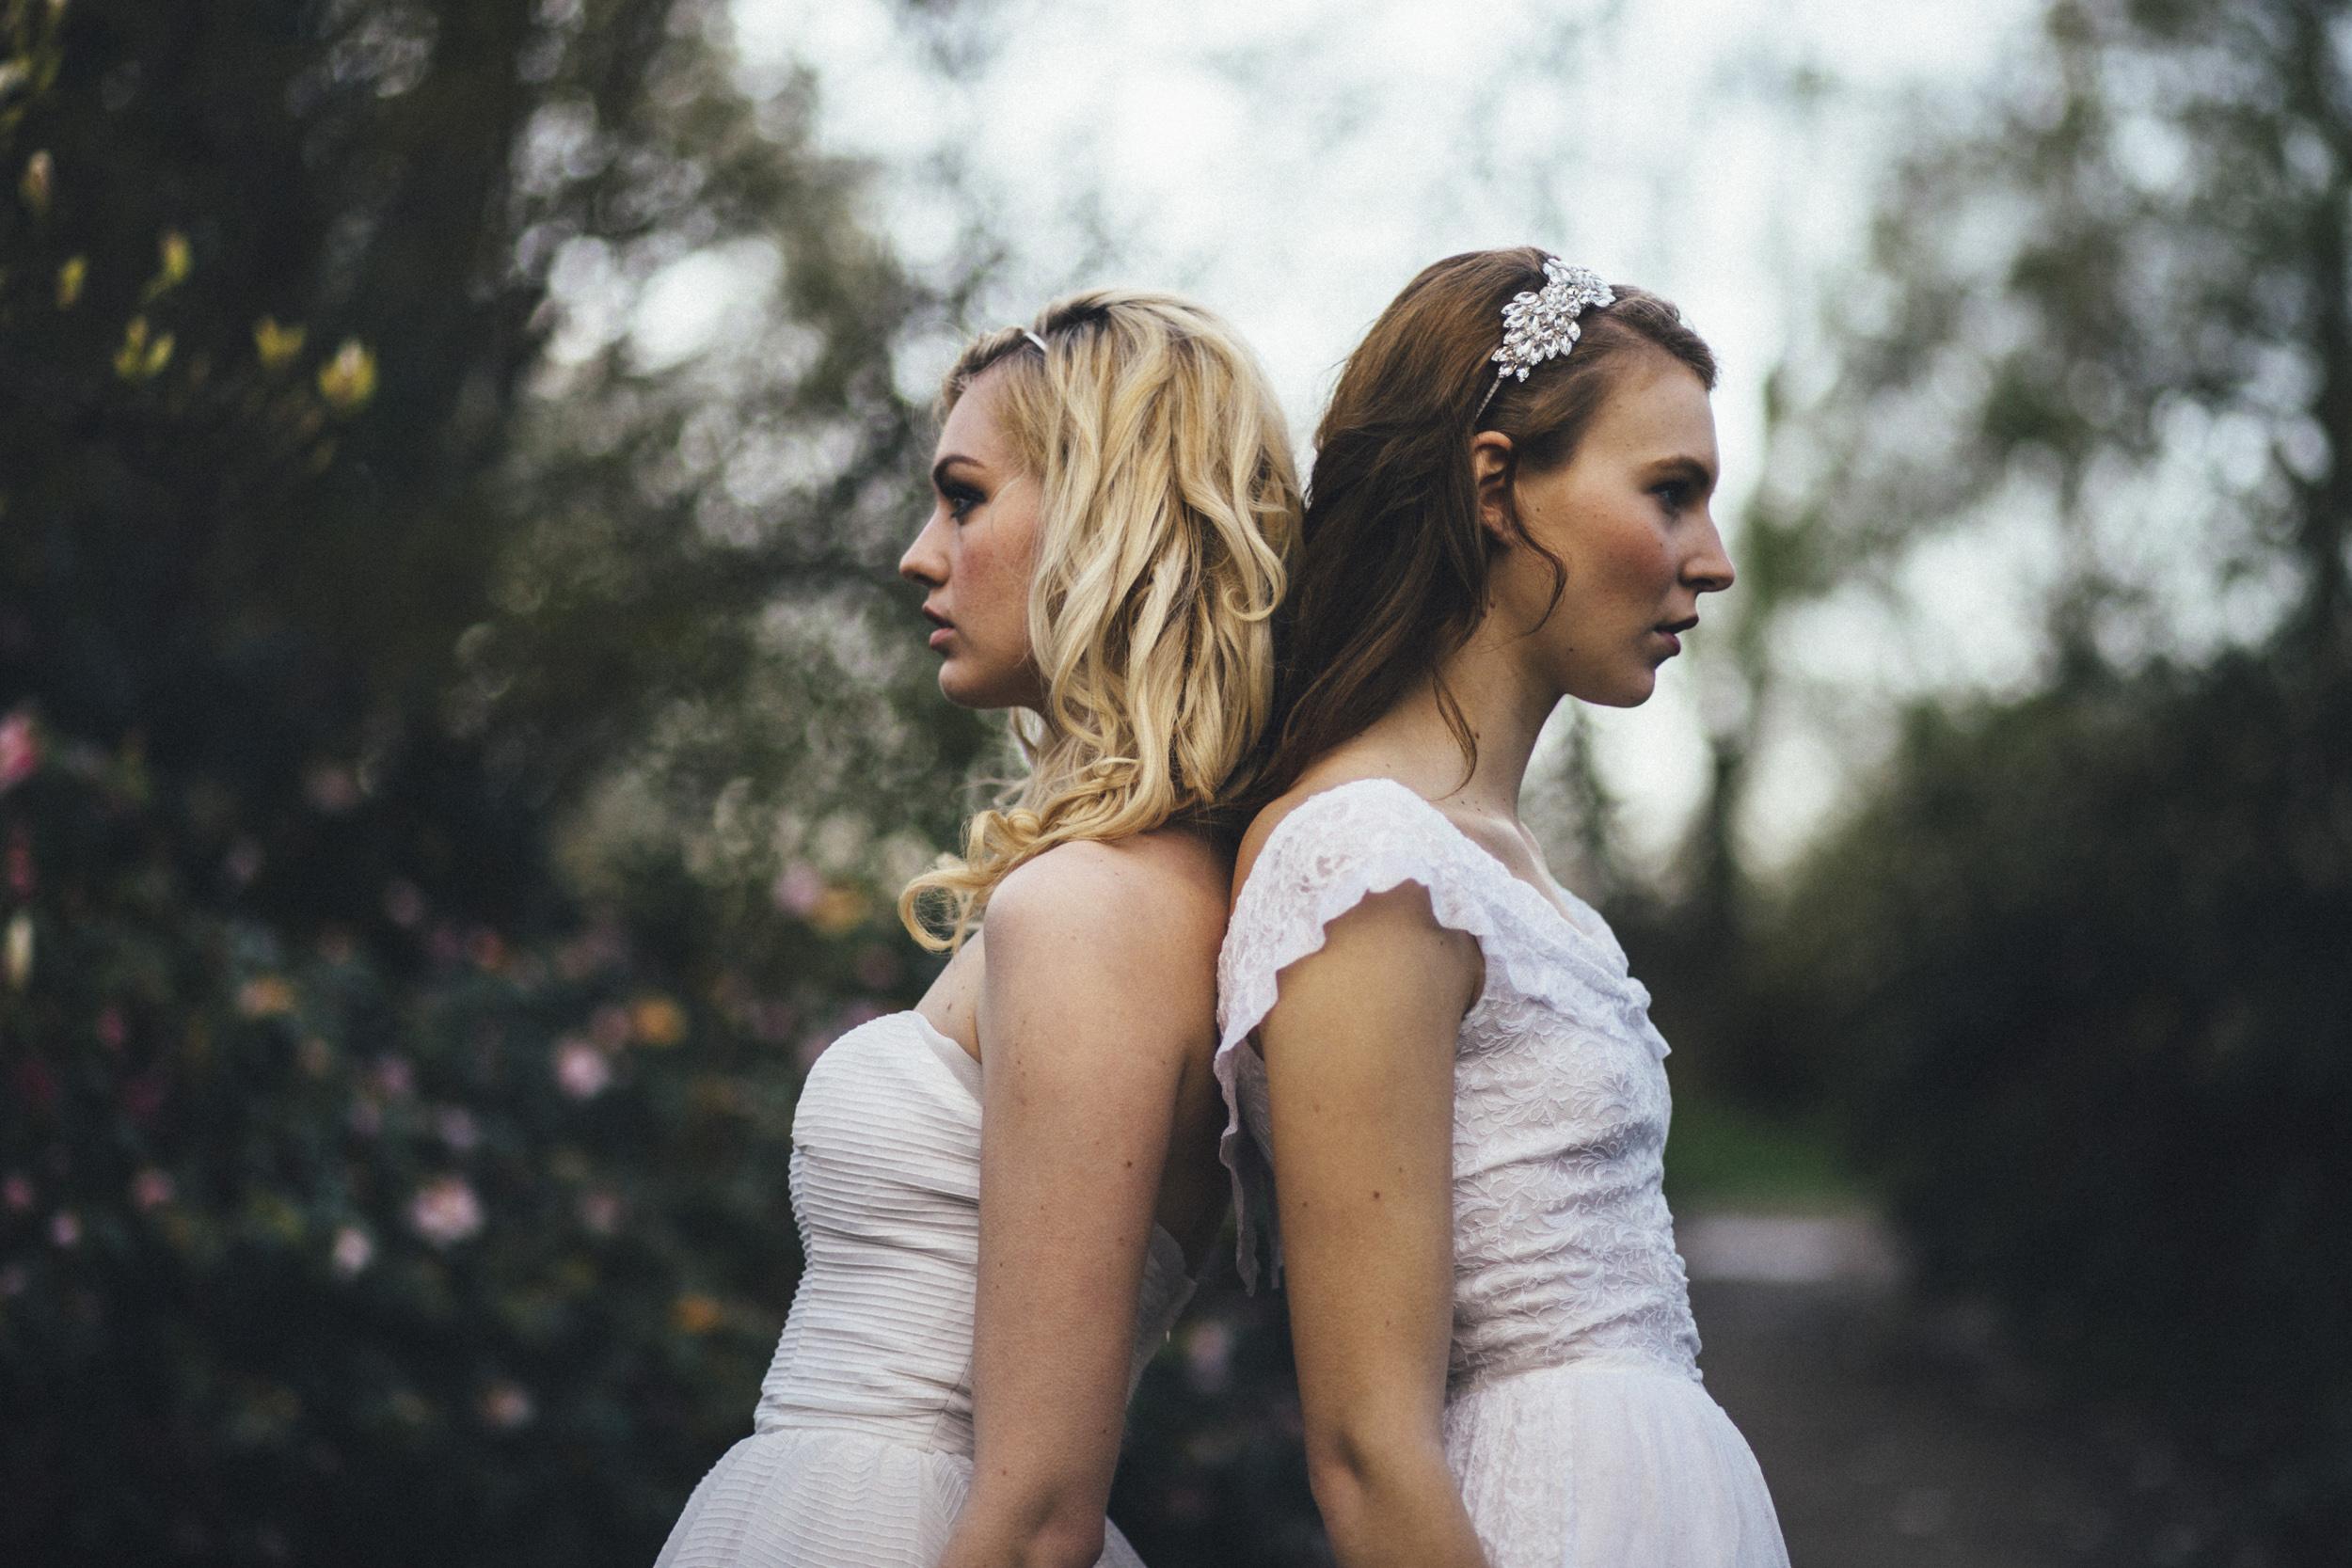 Spring-Bridal-Kate-Beaumont-Shelley-Richmond-Vintage-Wedding-Dress-19.jpg